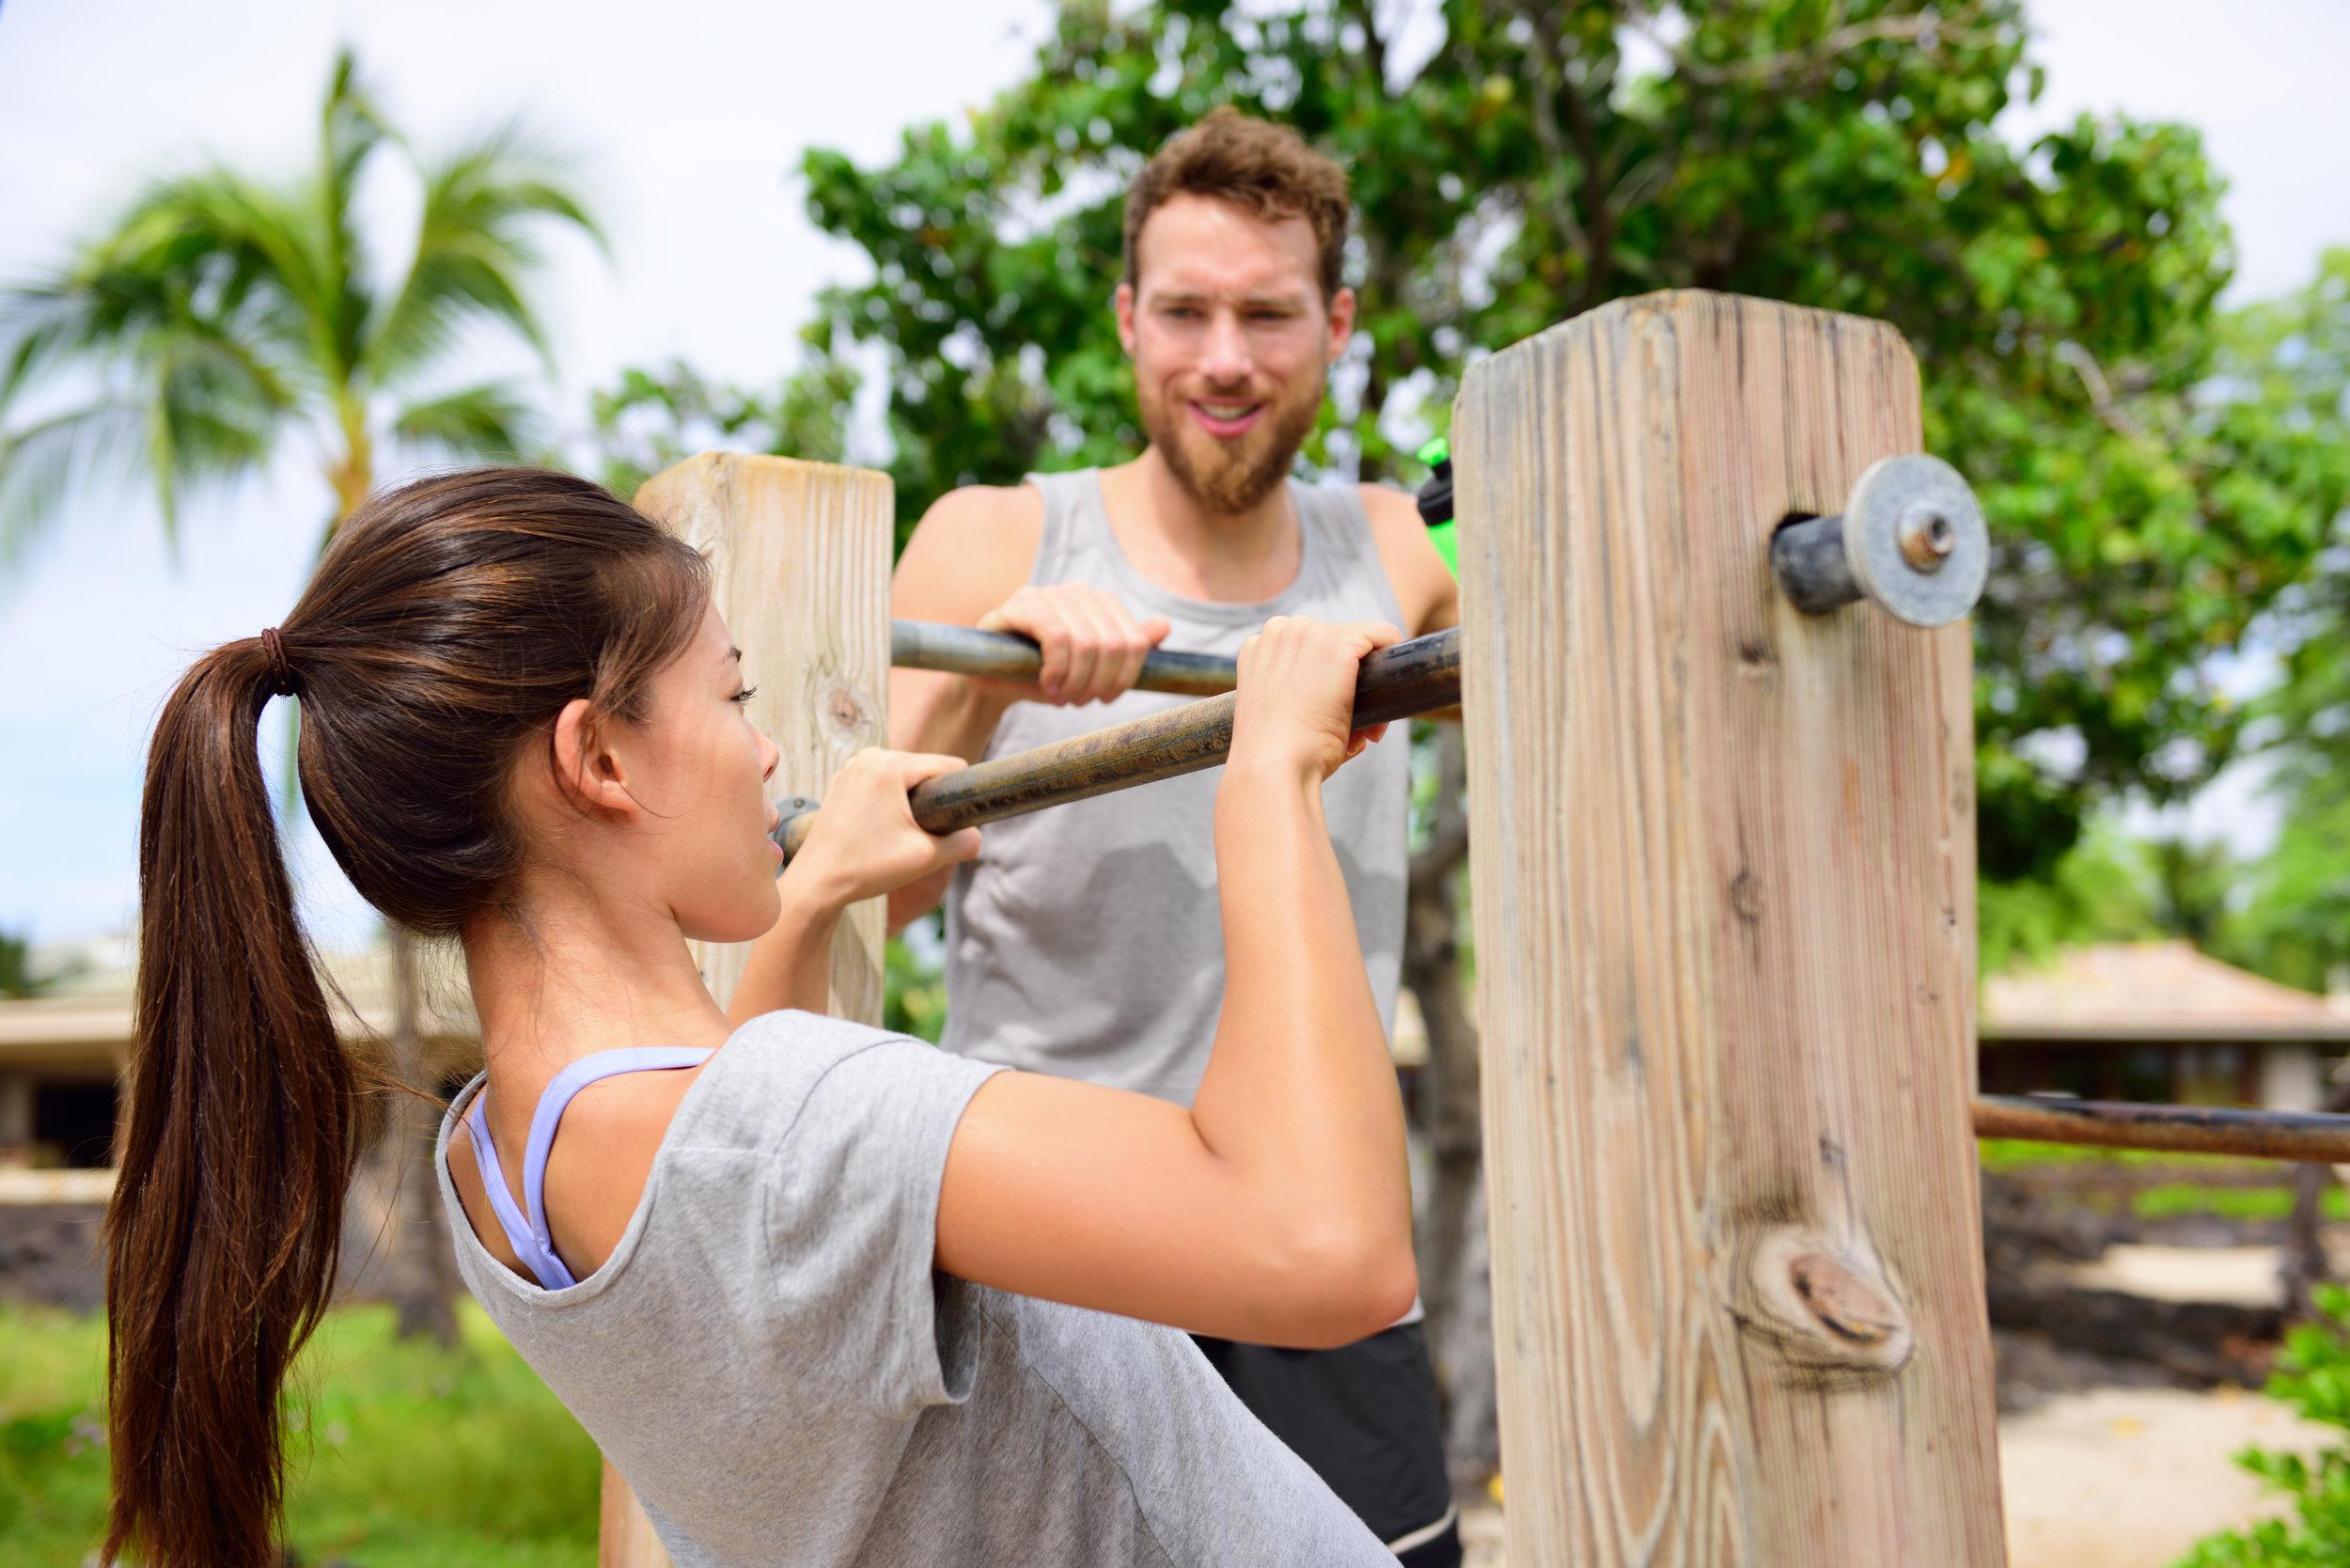 bigstock-Fitness-couple-training-on-chi-81325379.jpg